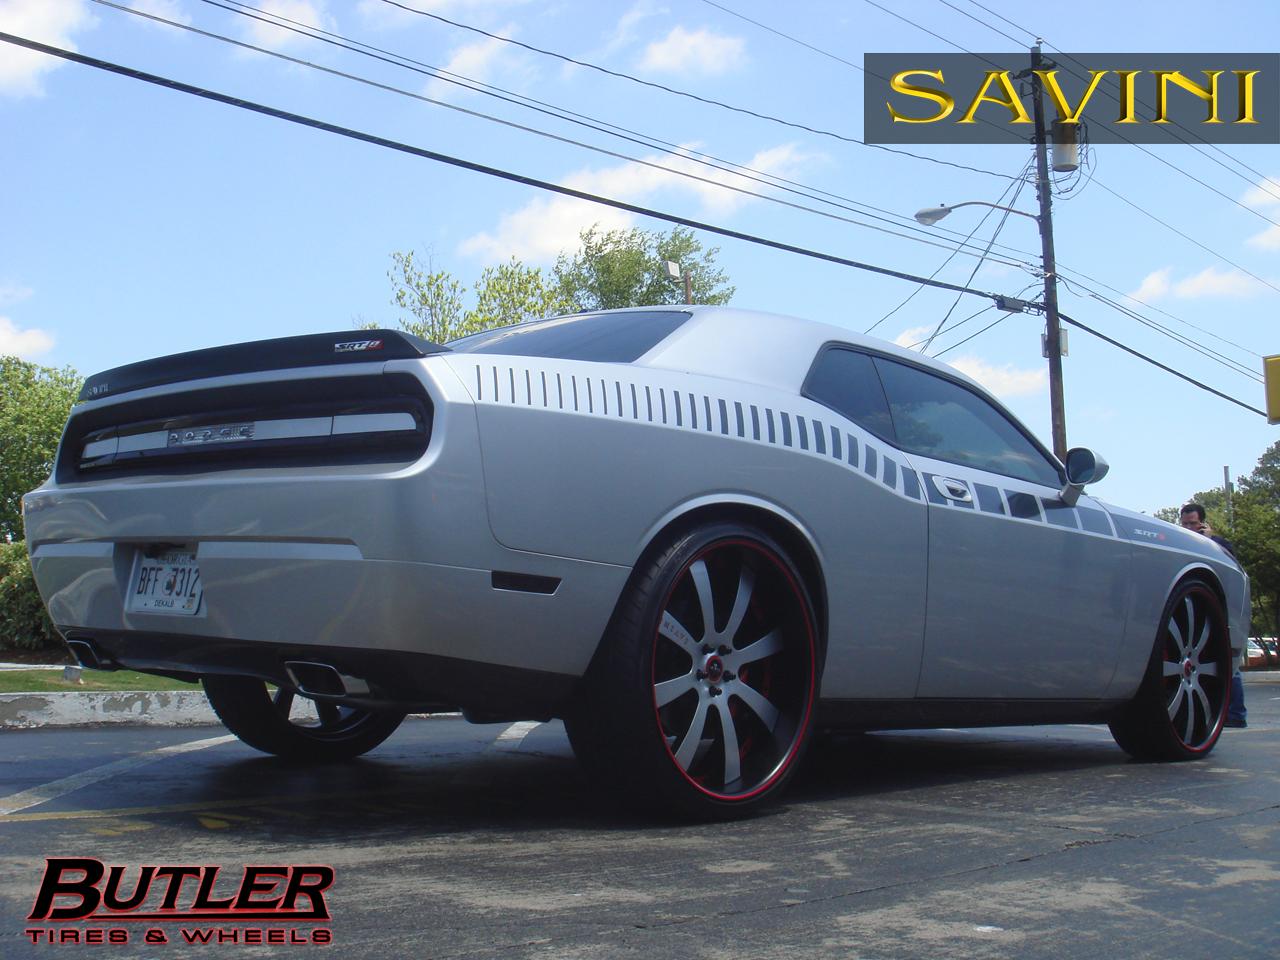 Challenger Savini Wheels